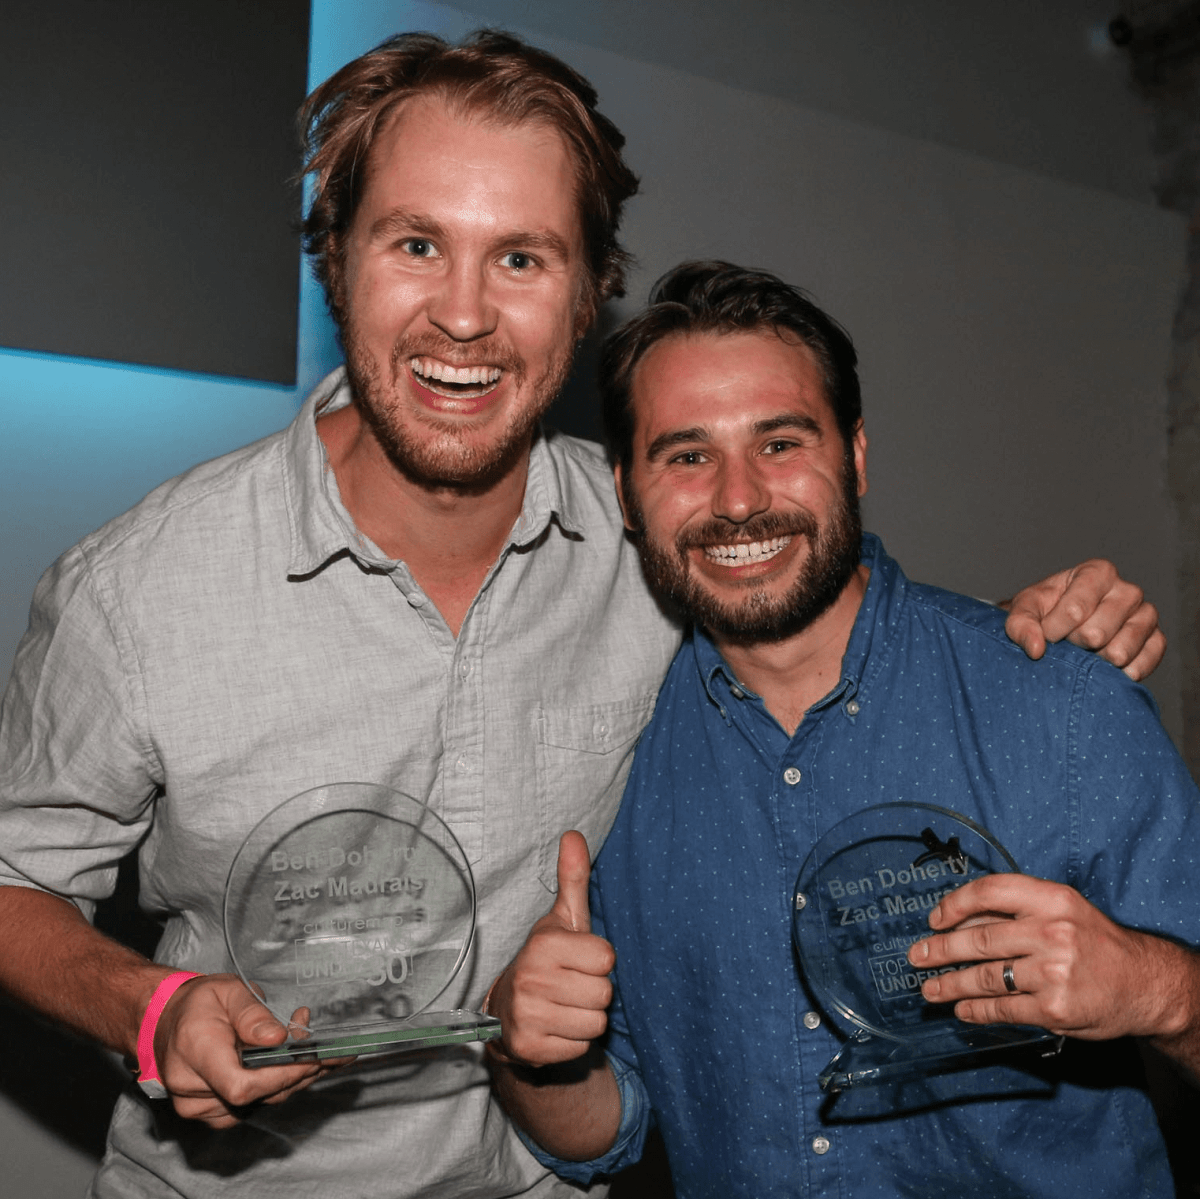 CultureMap Social Top Texans Under 30 Winners Favor Founders Zac Maurais Ben Doherty